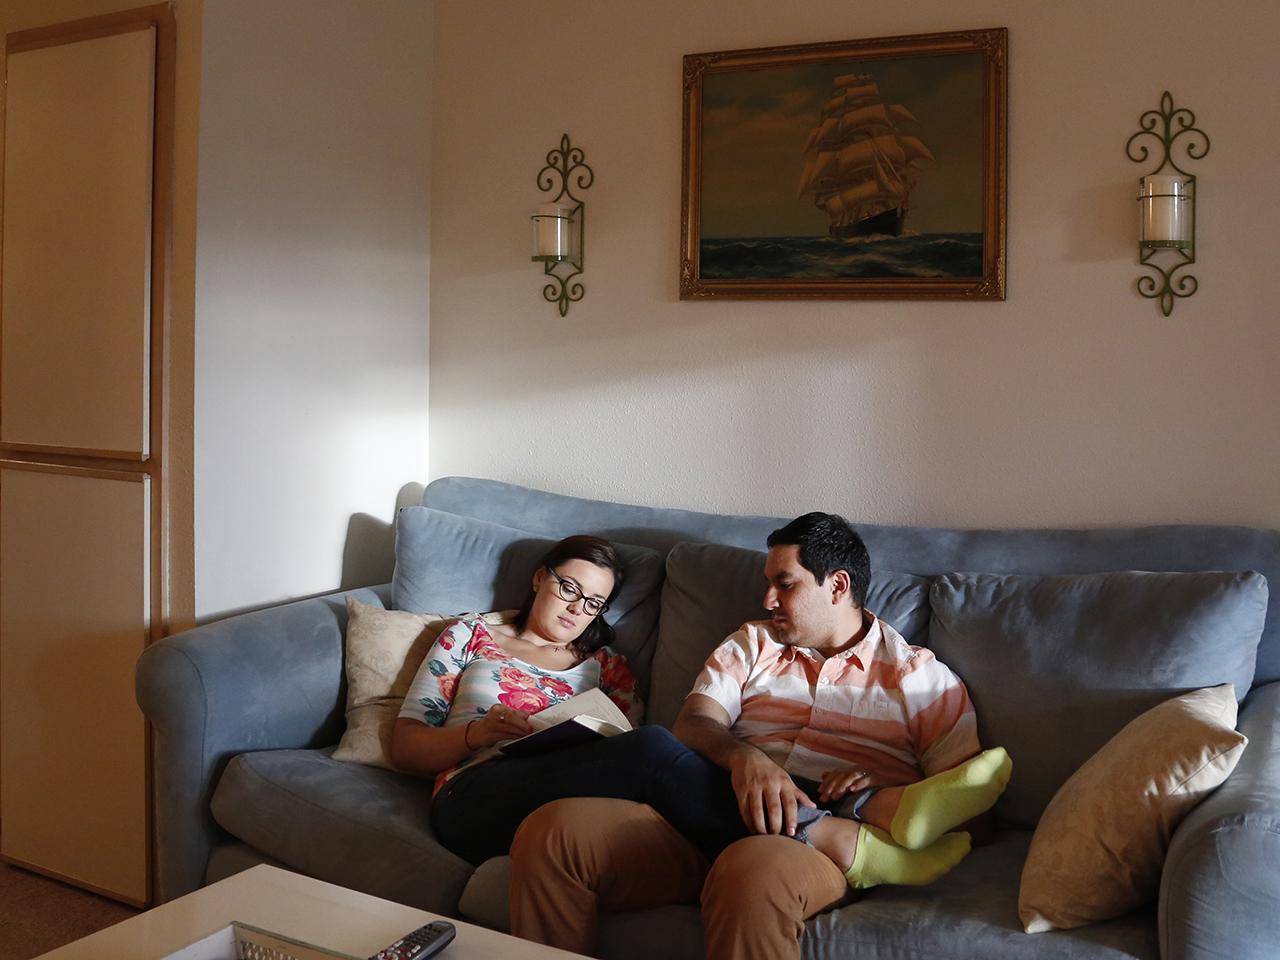 Karlee and Daniel Flores